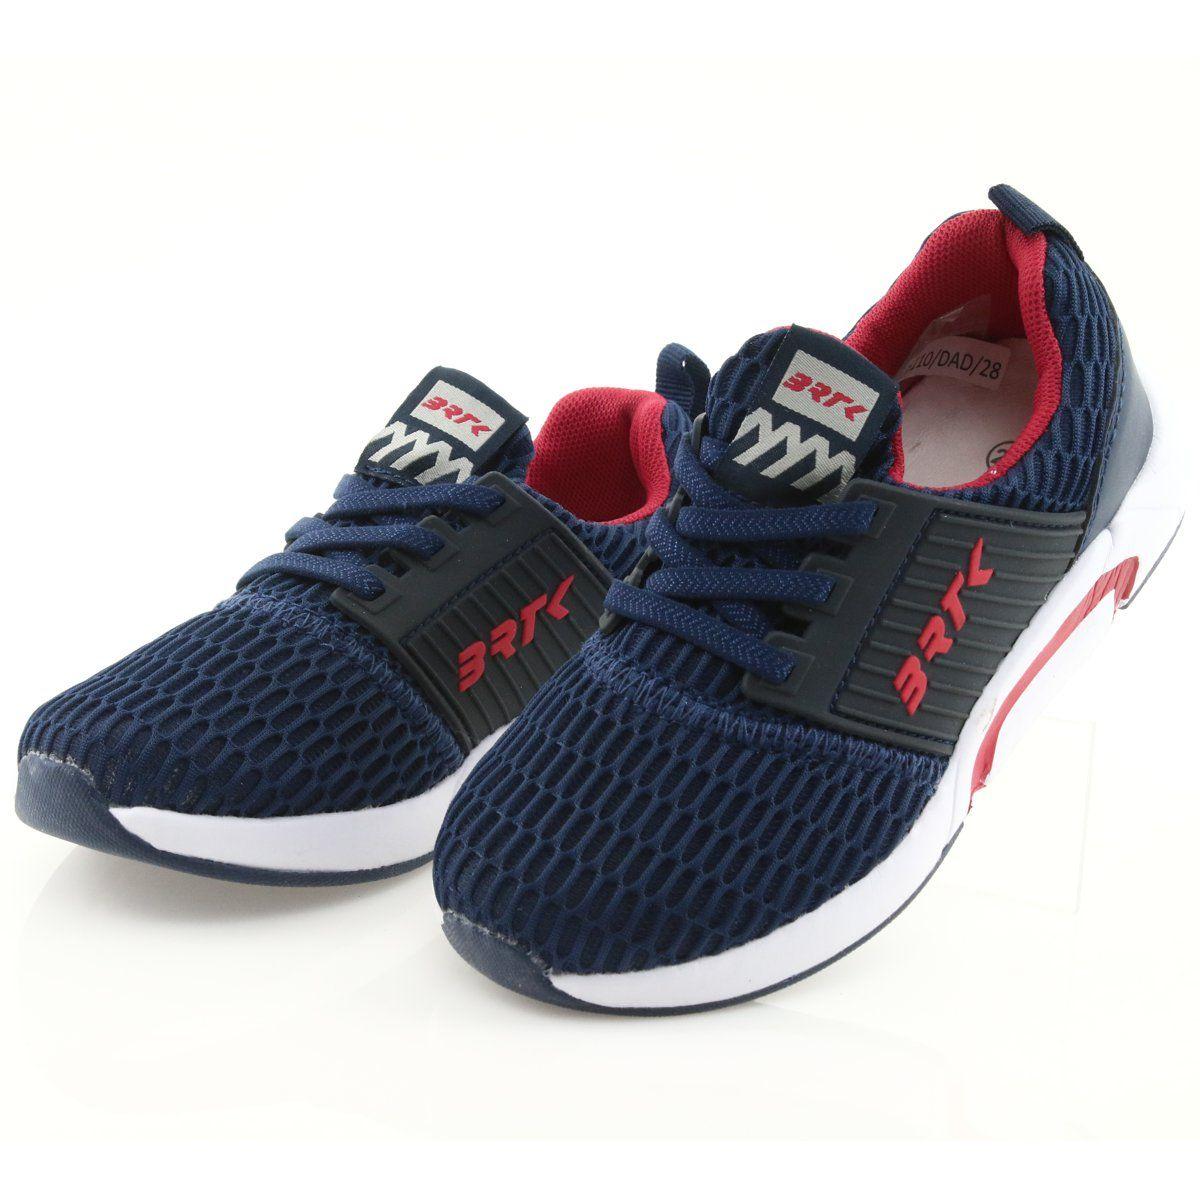 Bartek 55110 Buty Sportowe Wsuwane Granatowe Czerwone Sports Shoes Kid Shoes Shoes